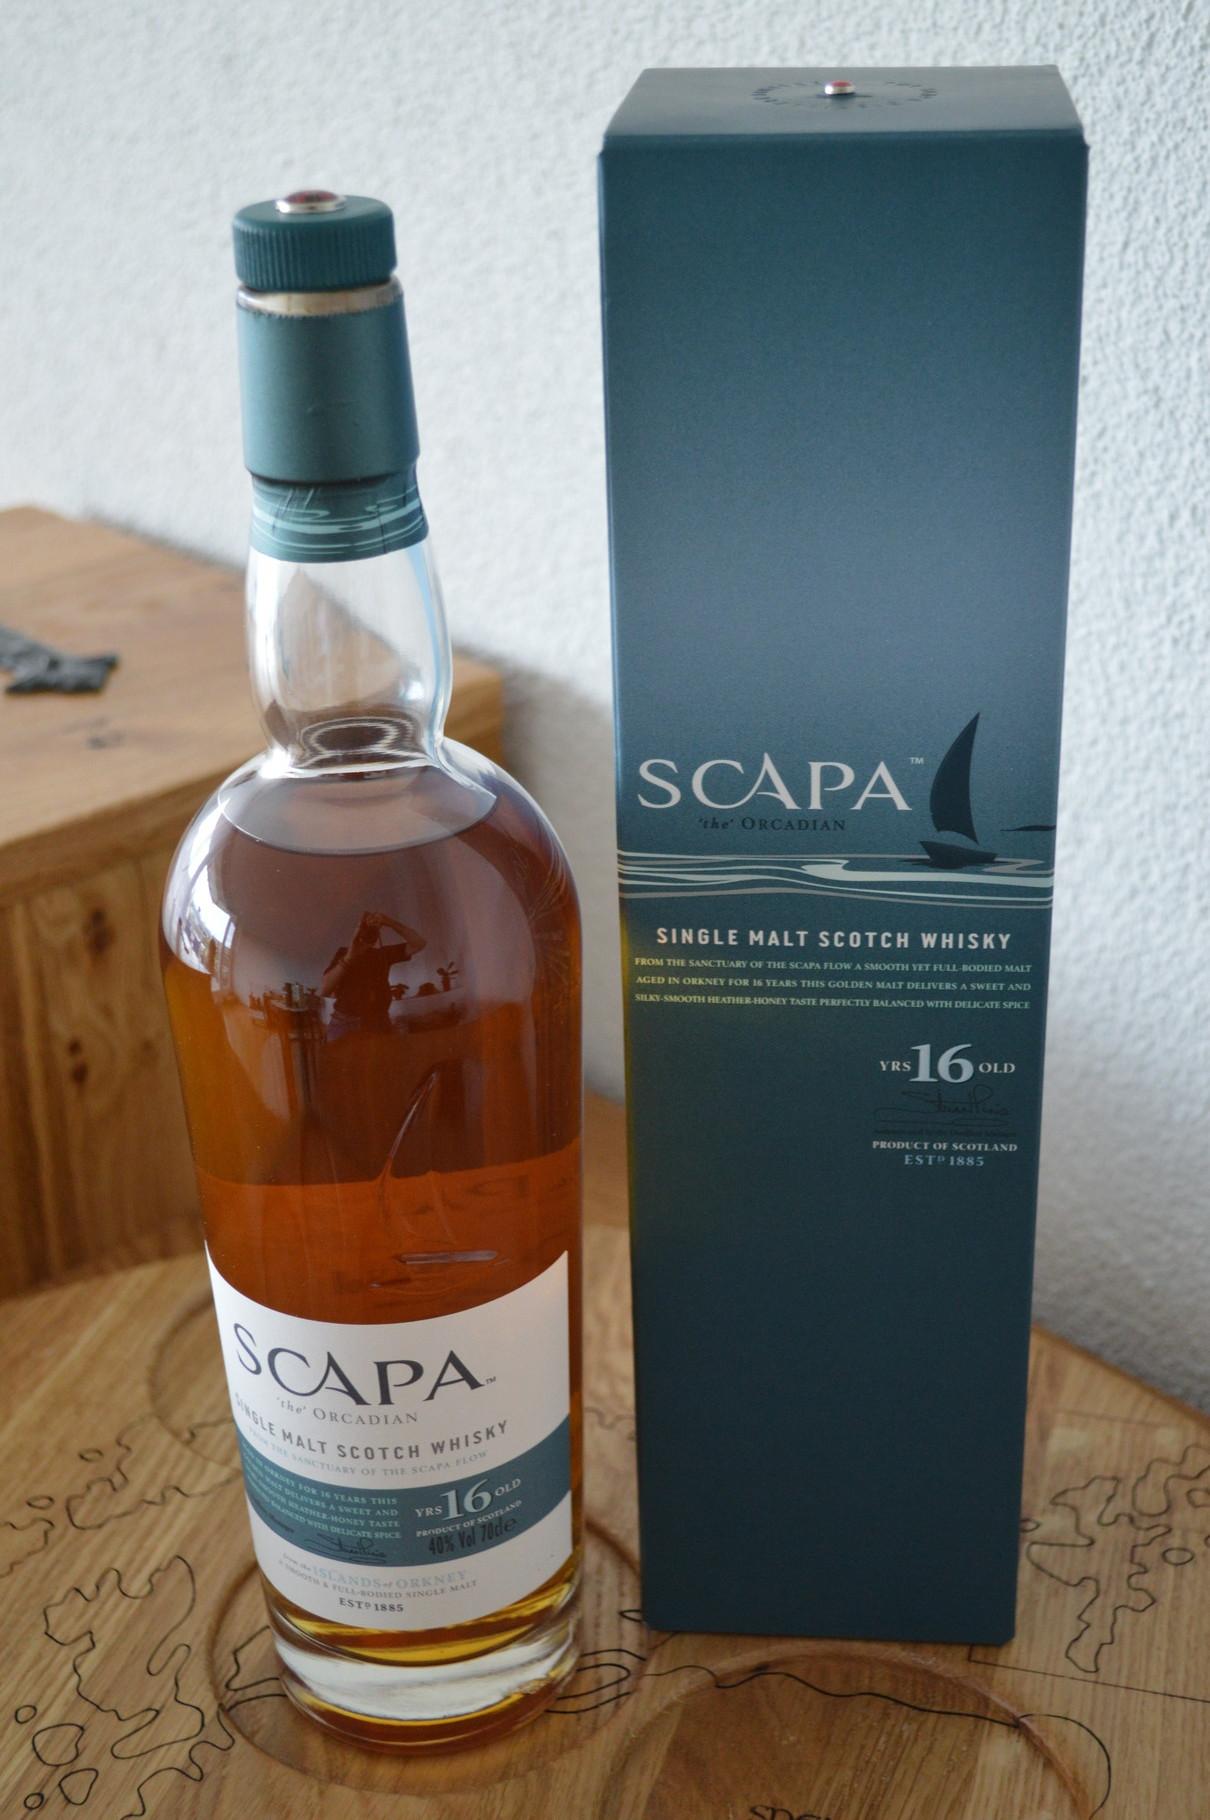 ISLANDS - Scapa* - Aged: 16 years - Bottler: Original - 70cl - 40%